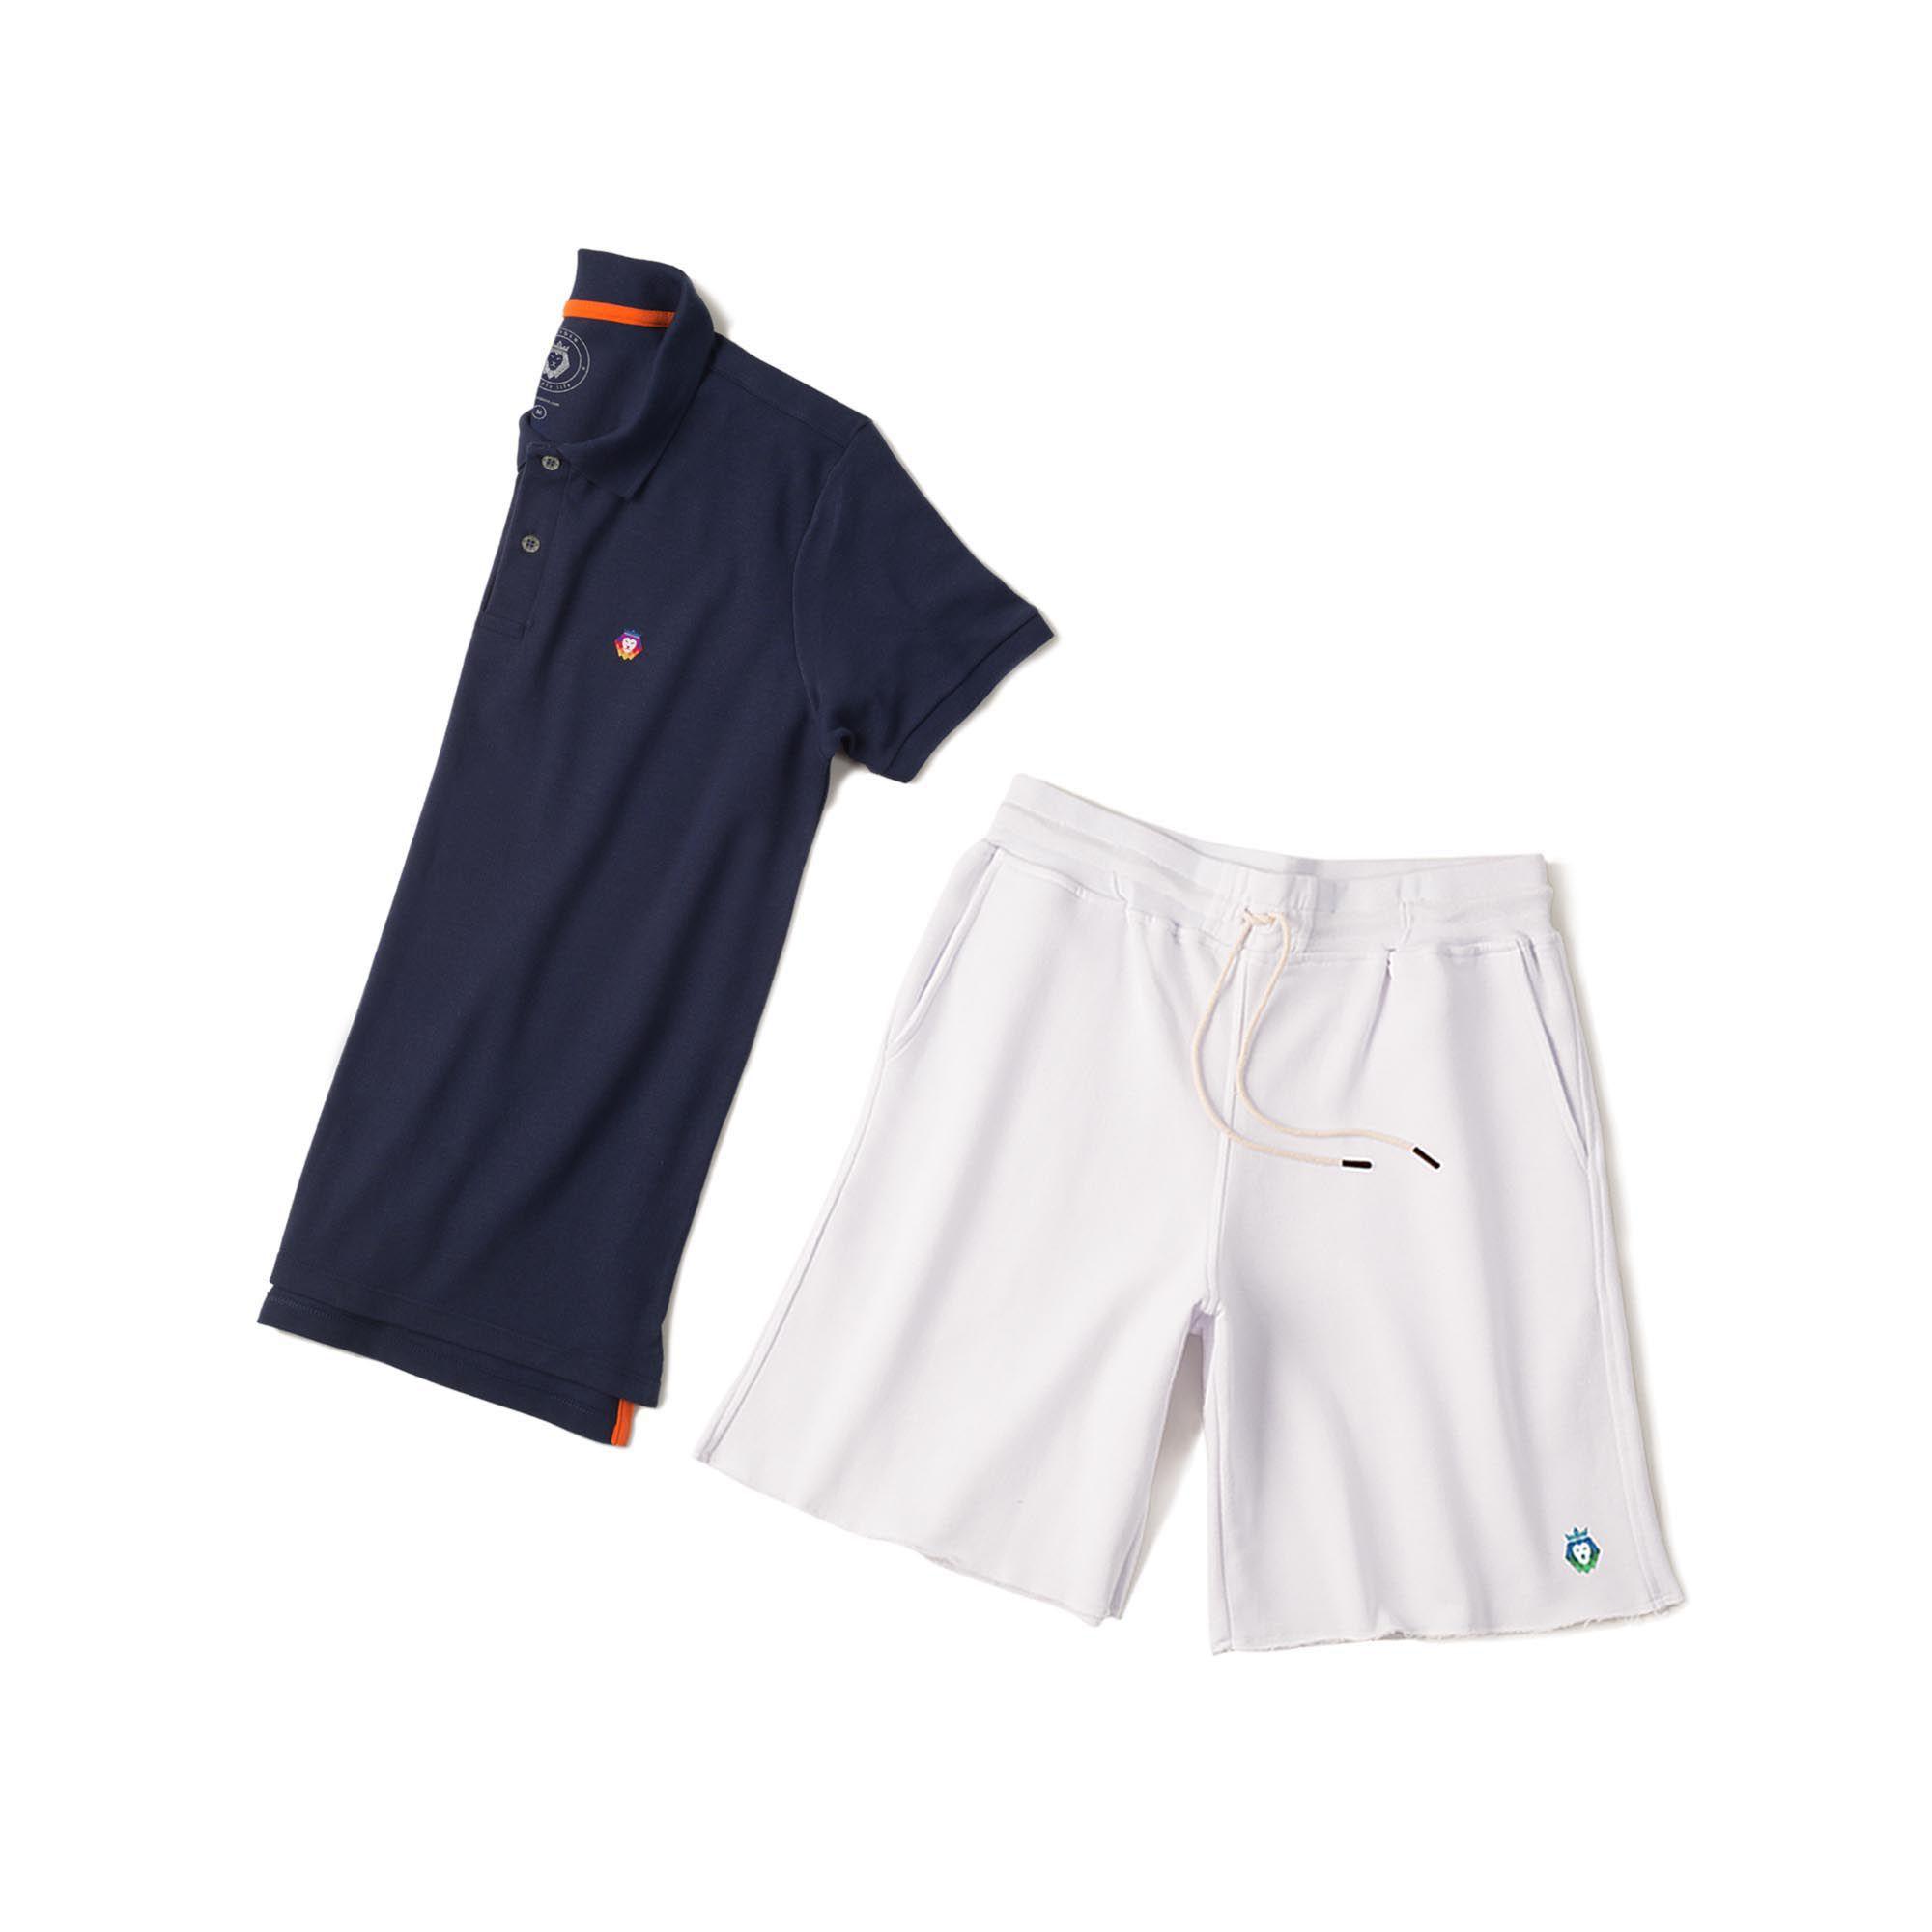 Kit 1 Bermuda Basic Branca + 1 Camisa Polo Style Azul Marinho Zaiden Masculina